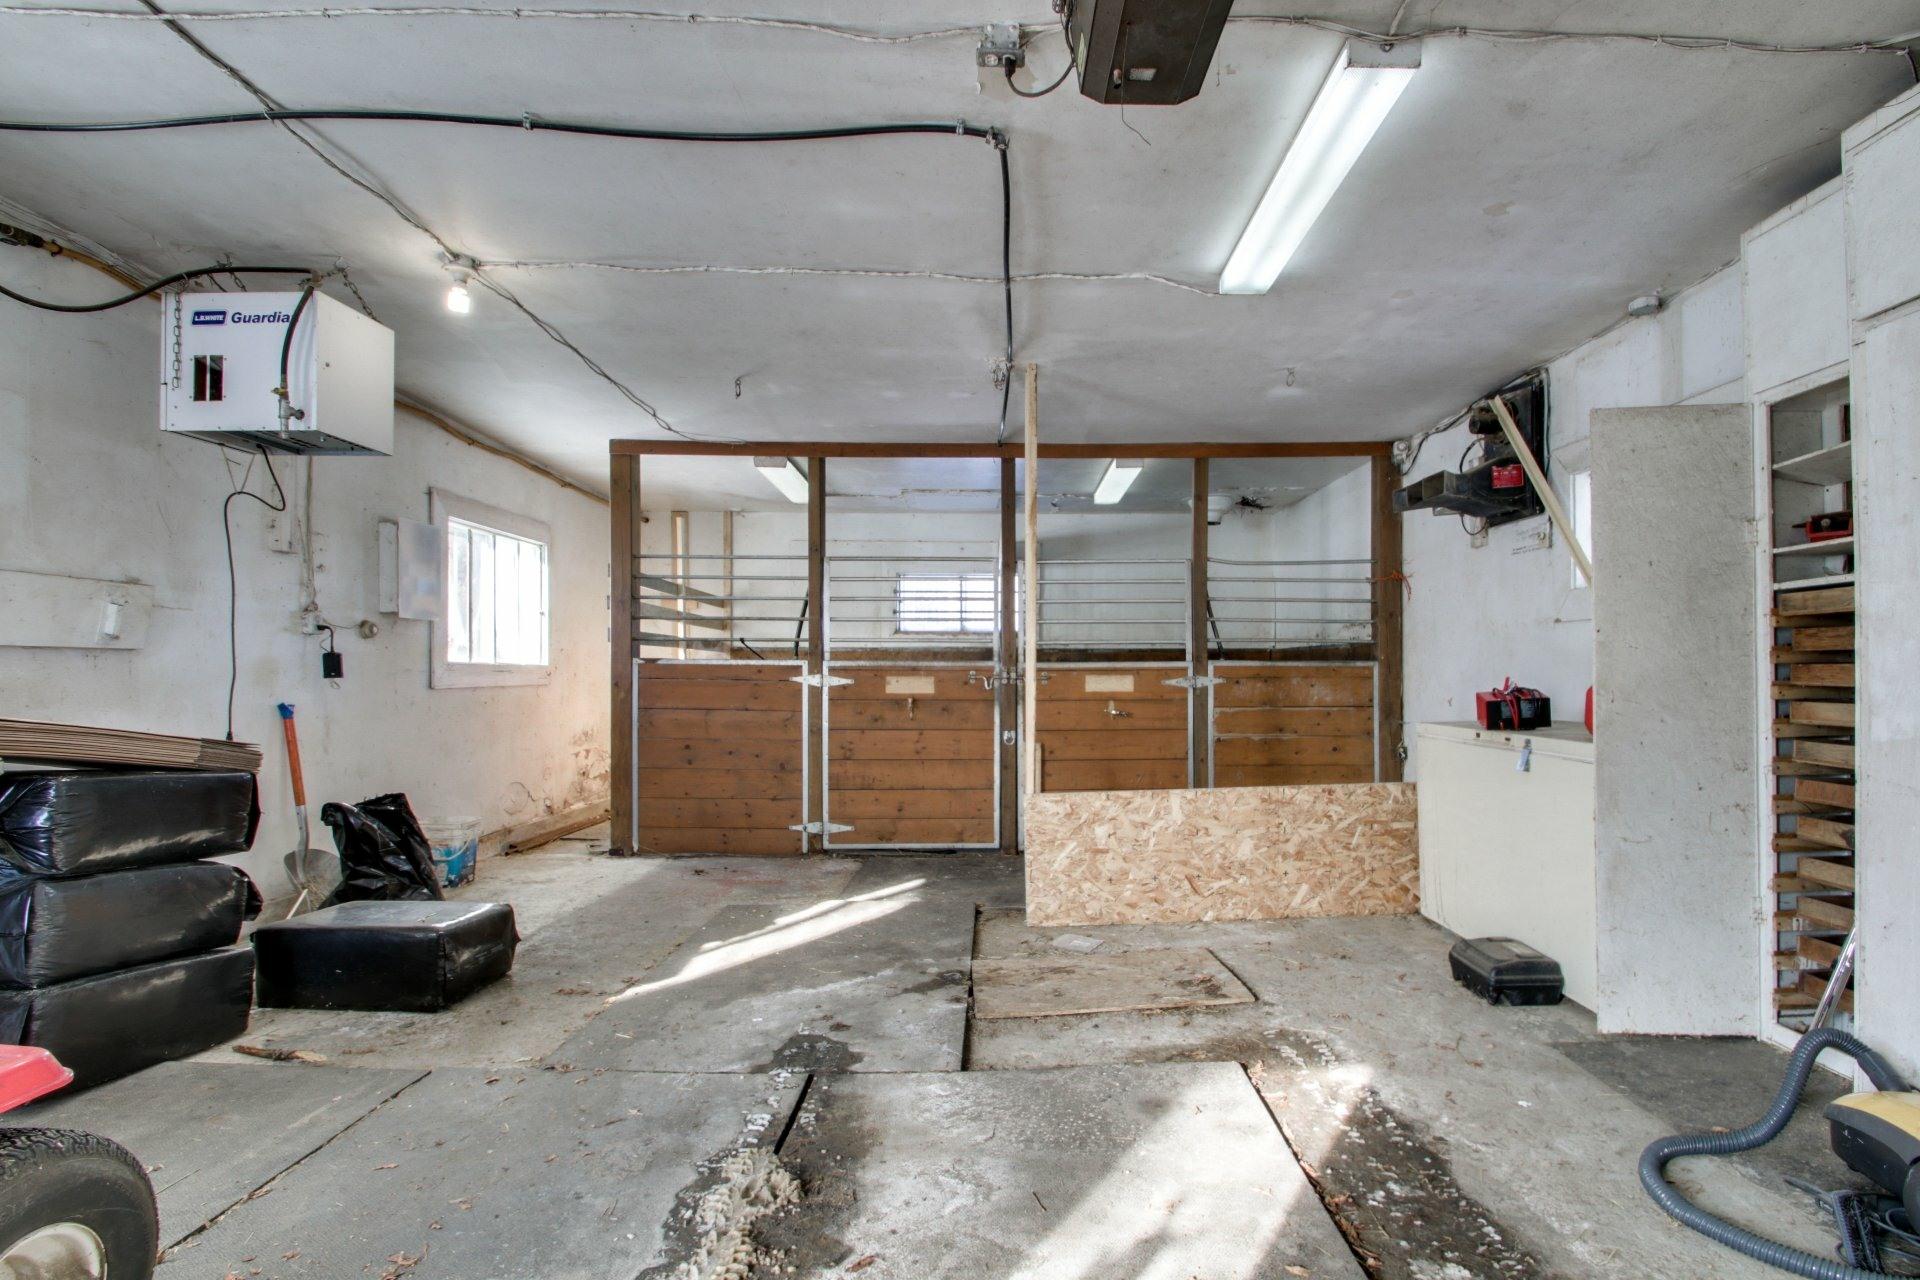 image 31 - Farmhouse For sale Sainte-Marie-de-Blandford - 8 rooms